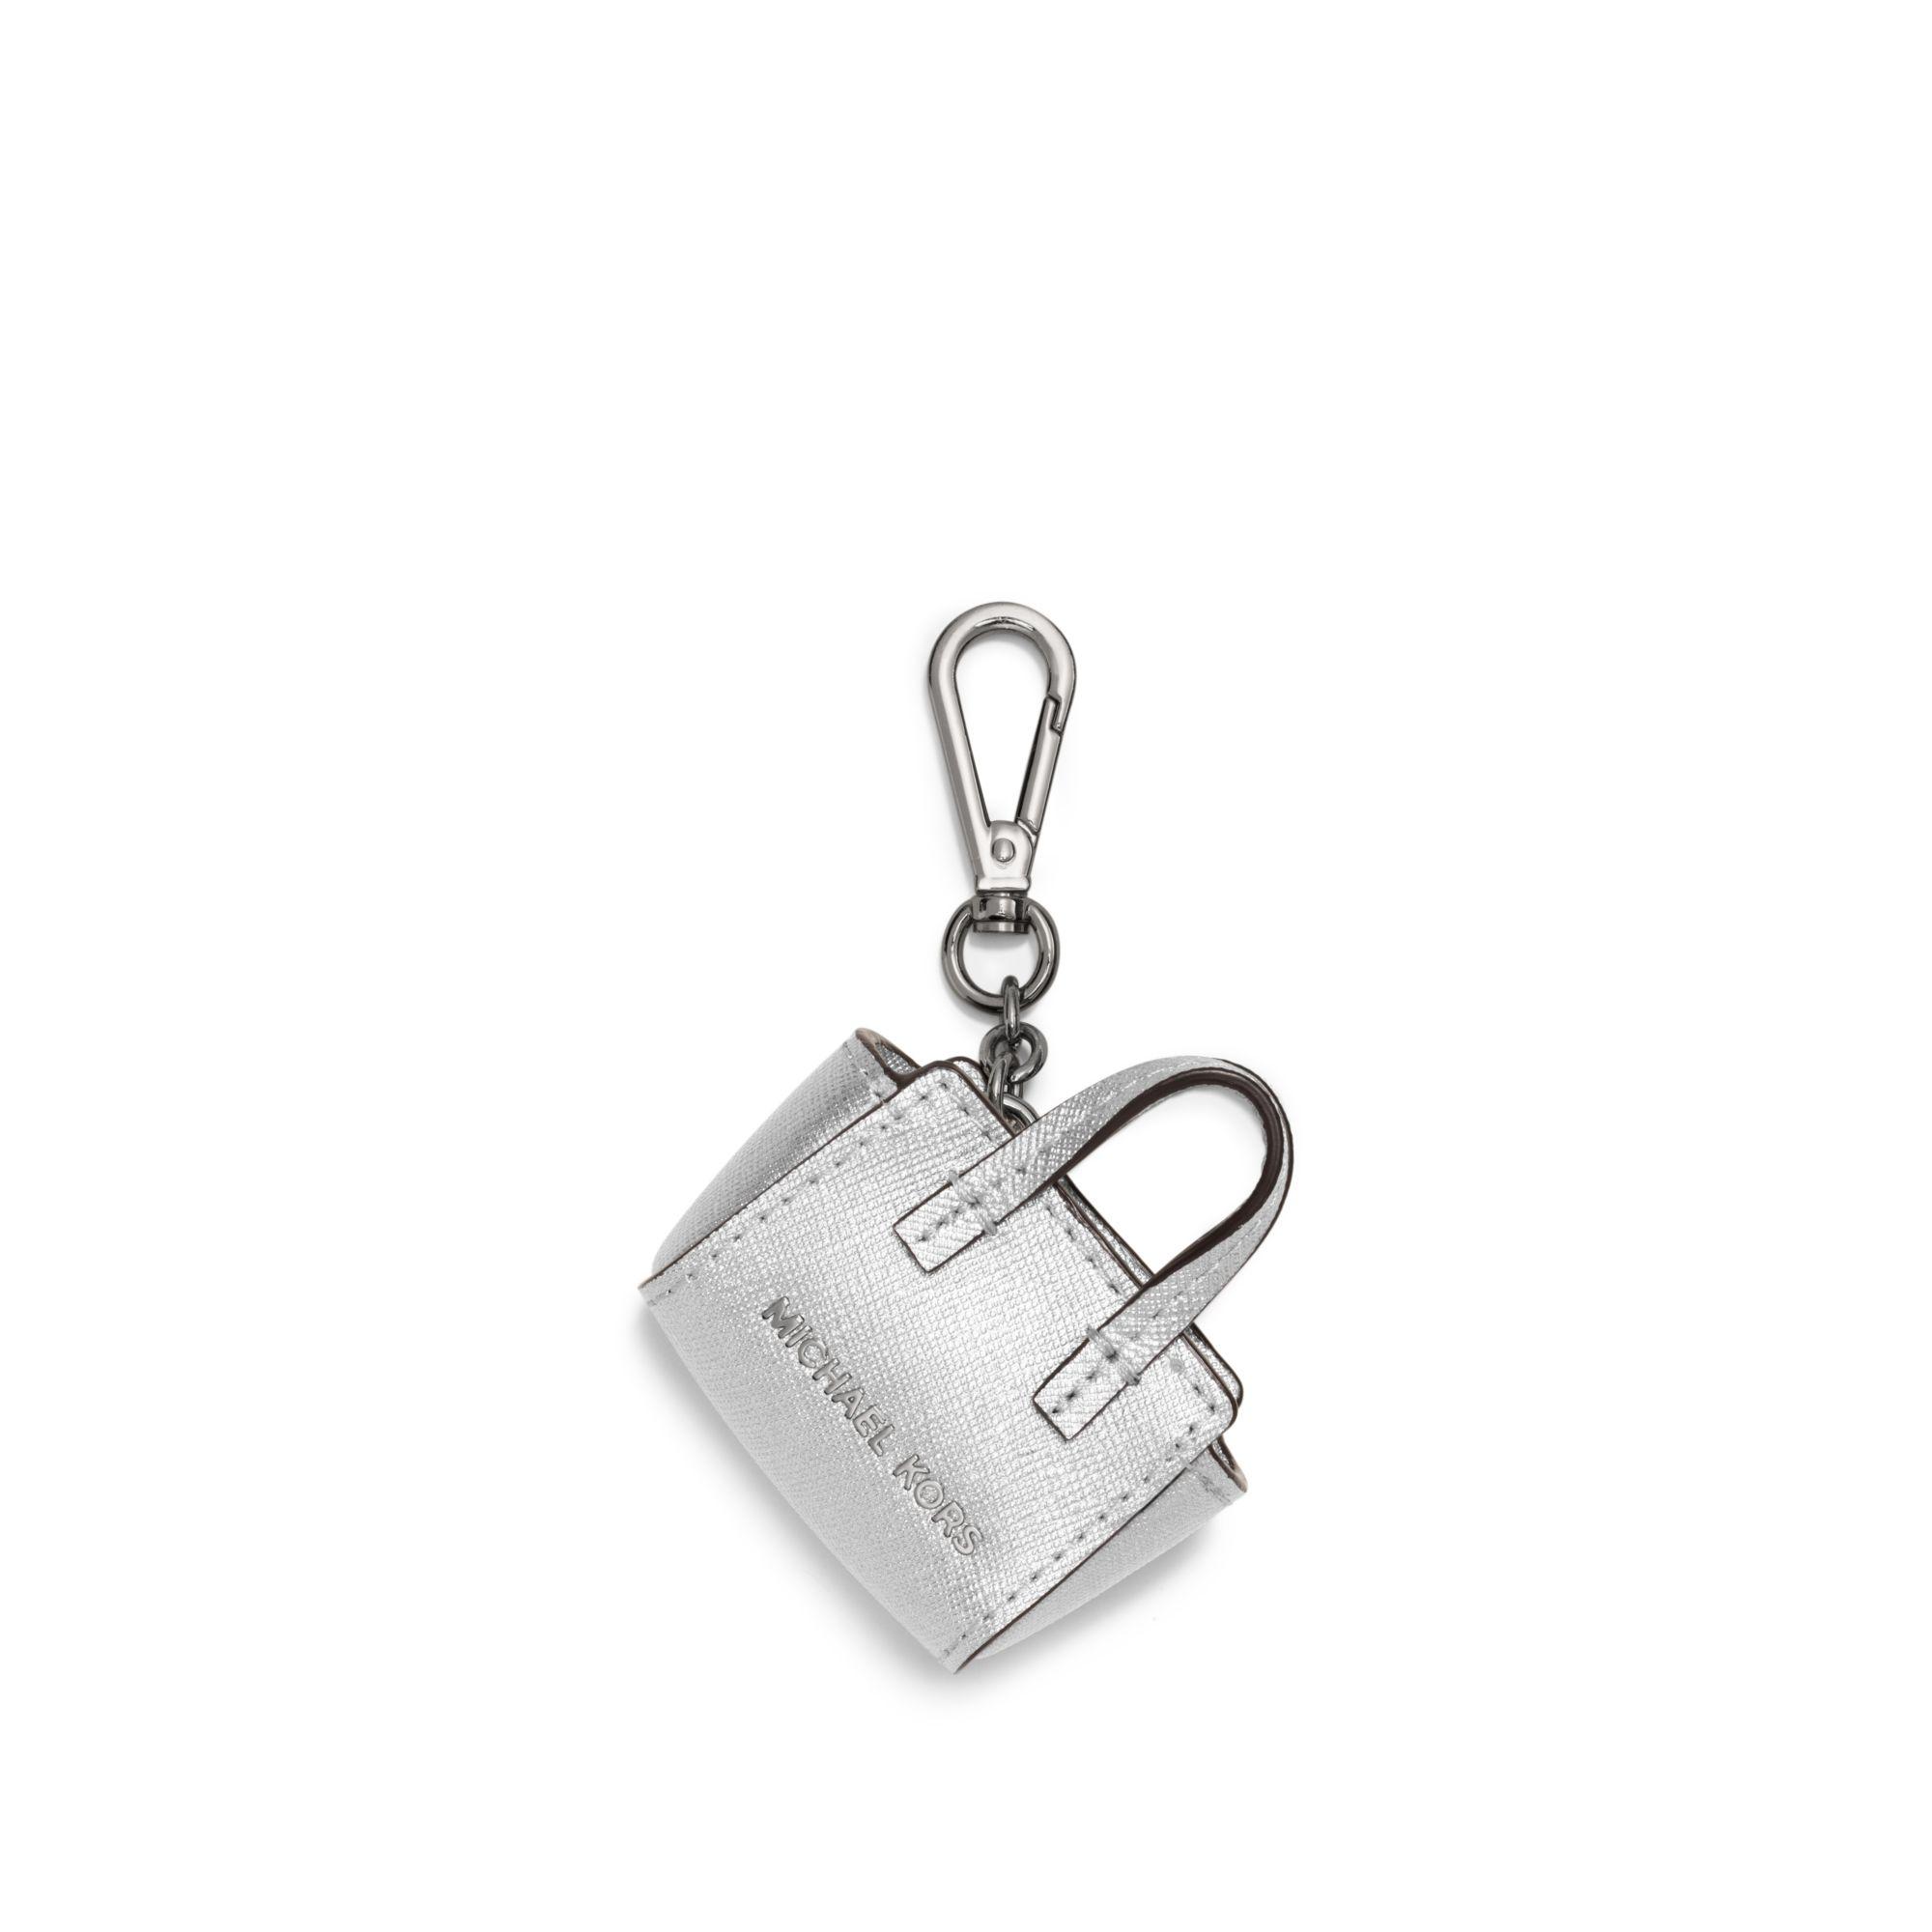 9e3943ab90efc Coin Purse Keychain Michael Kors - Best Purse Image Ccdbb.Org